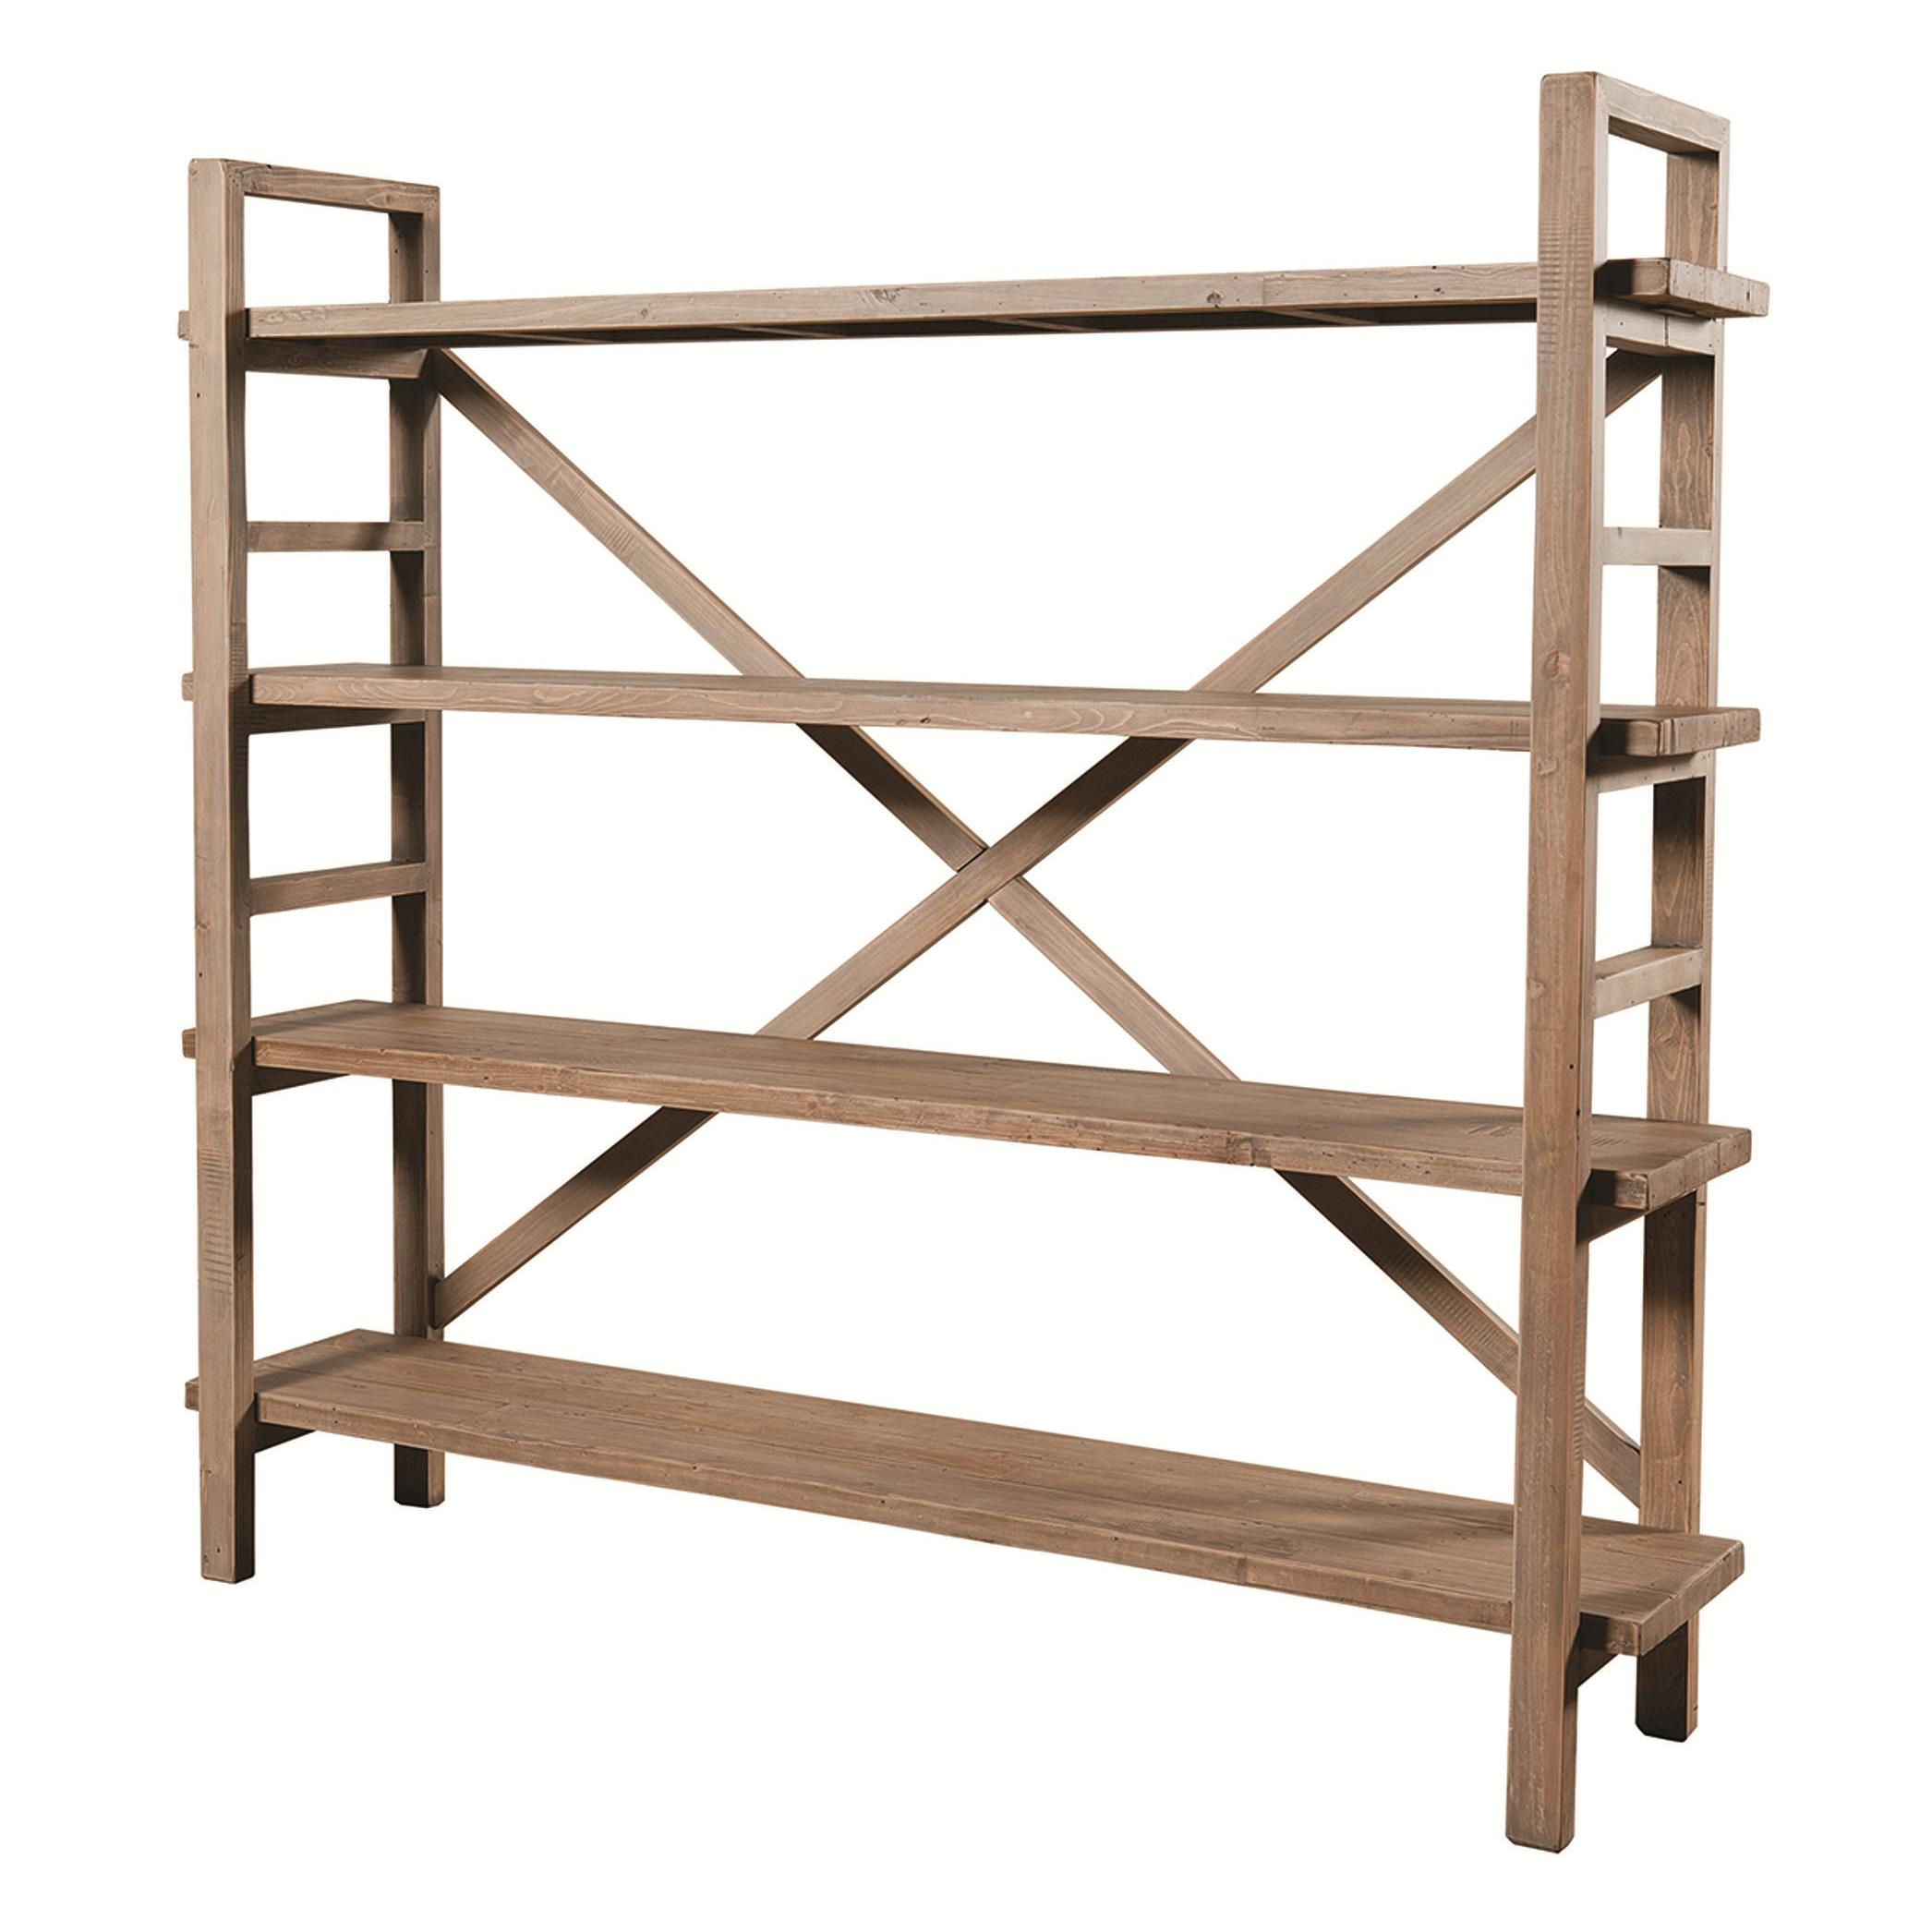 with img and superb dressers bookshelf shelf dresser great back shelves open